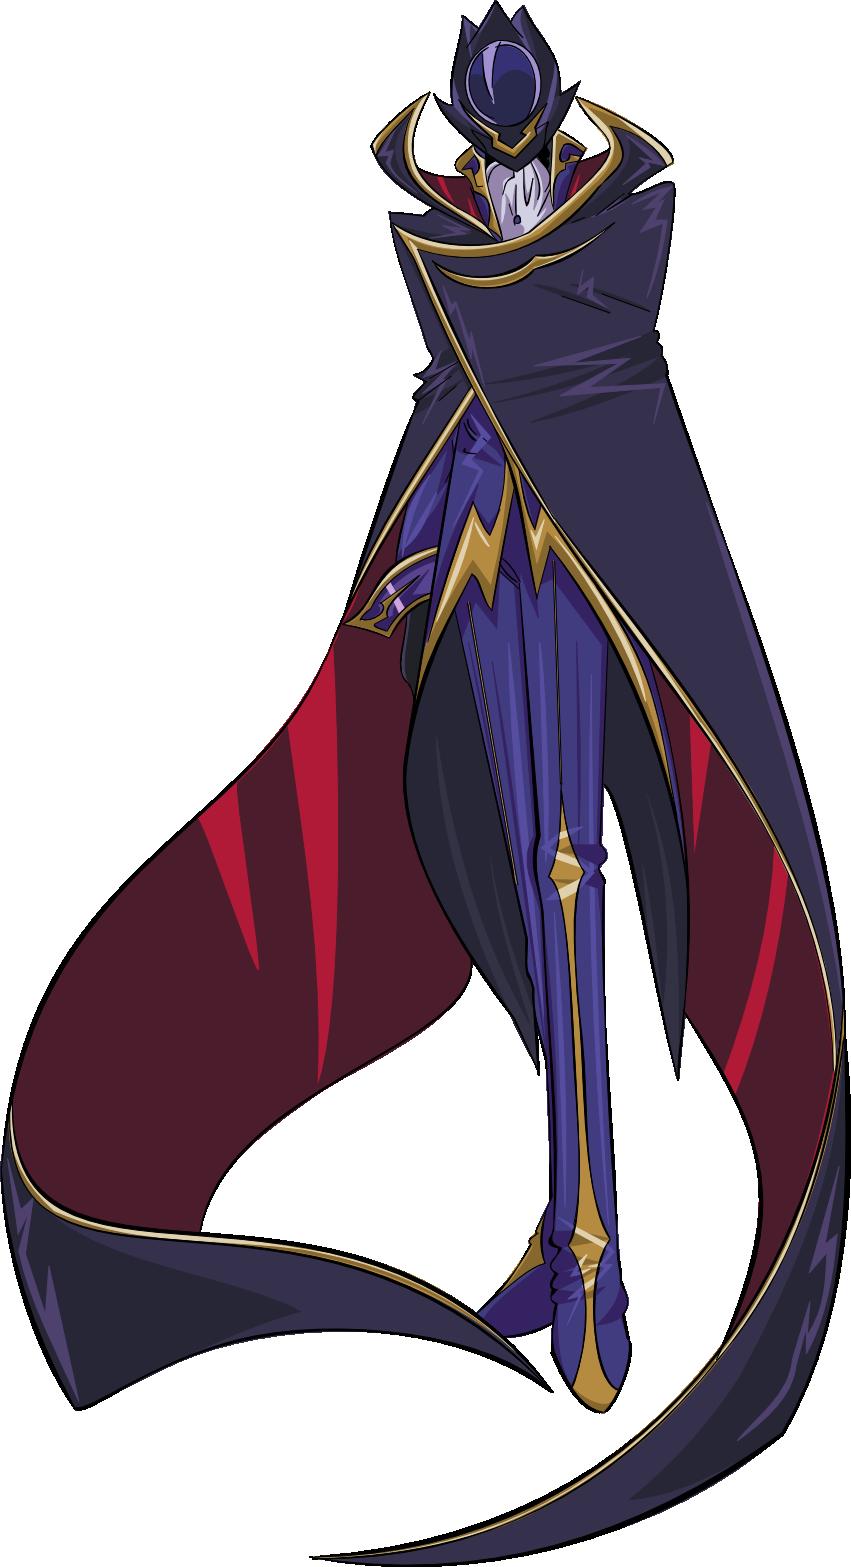 Lelouch Vi Britannia Code Geass Infinite Loops Wiki